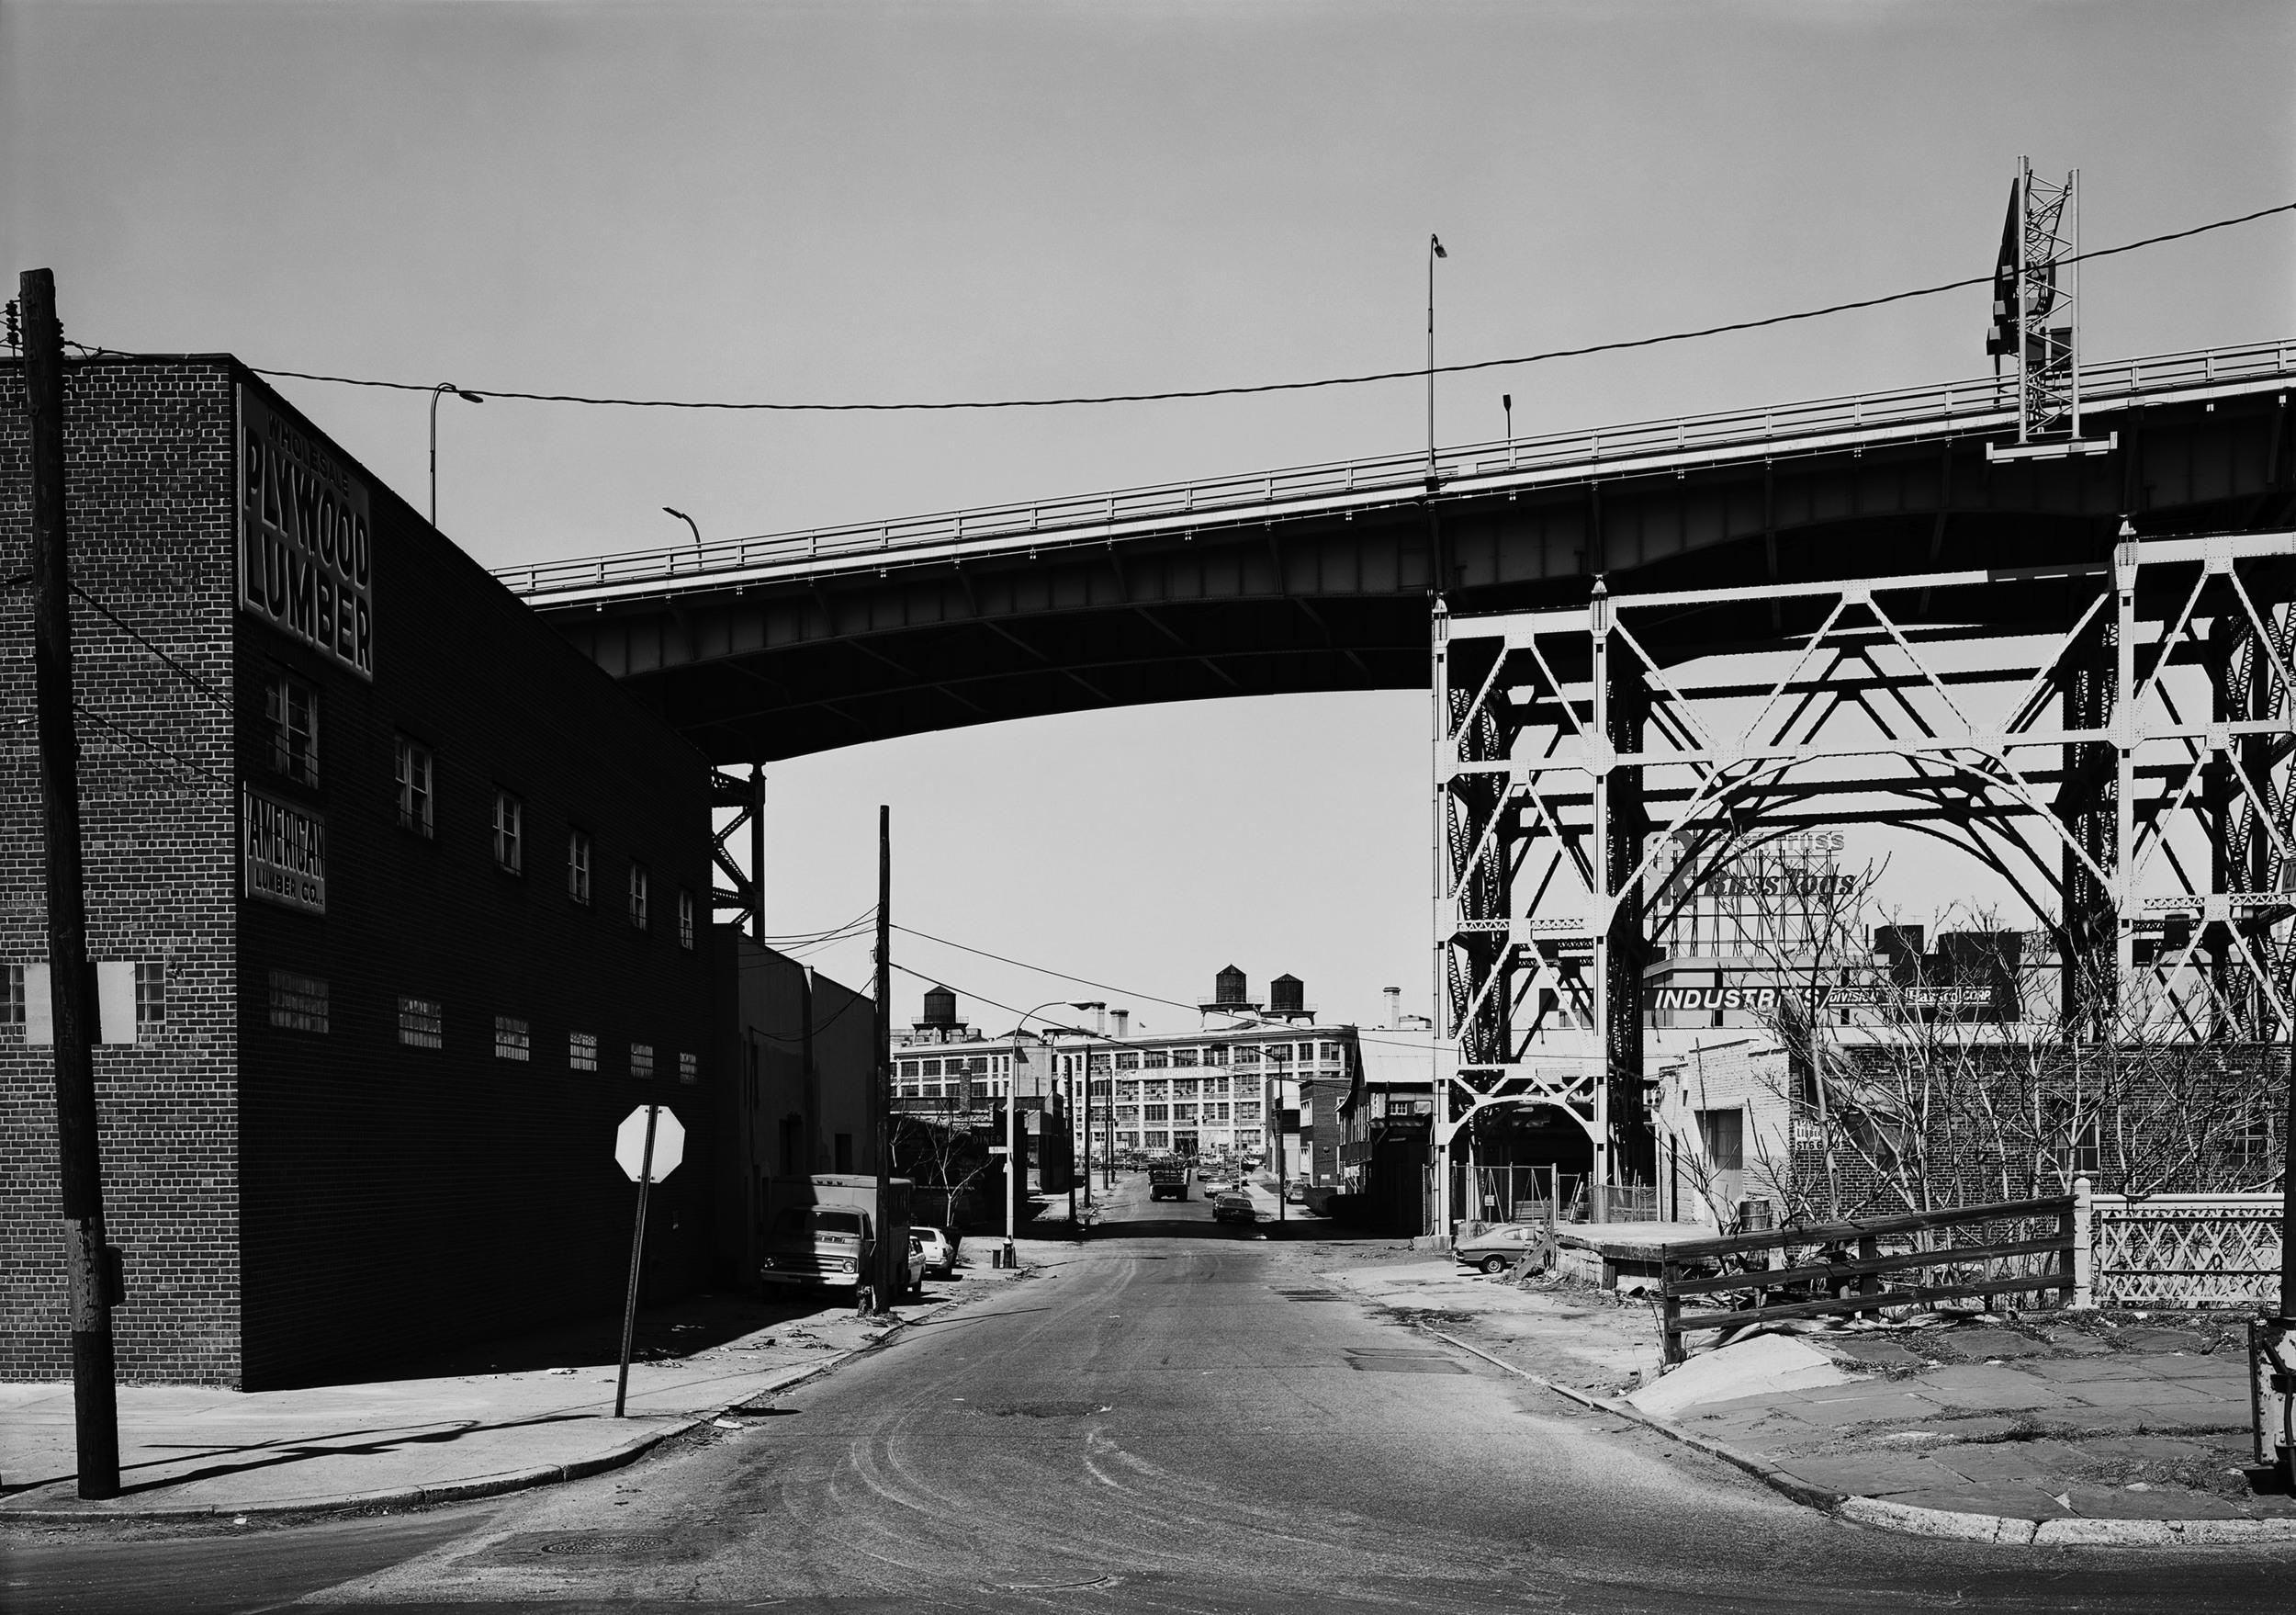 27th Street at Borden Avenue,